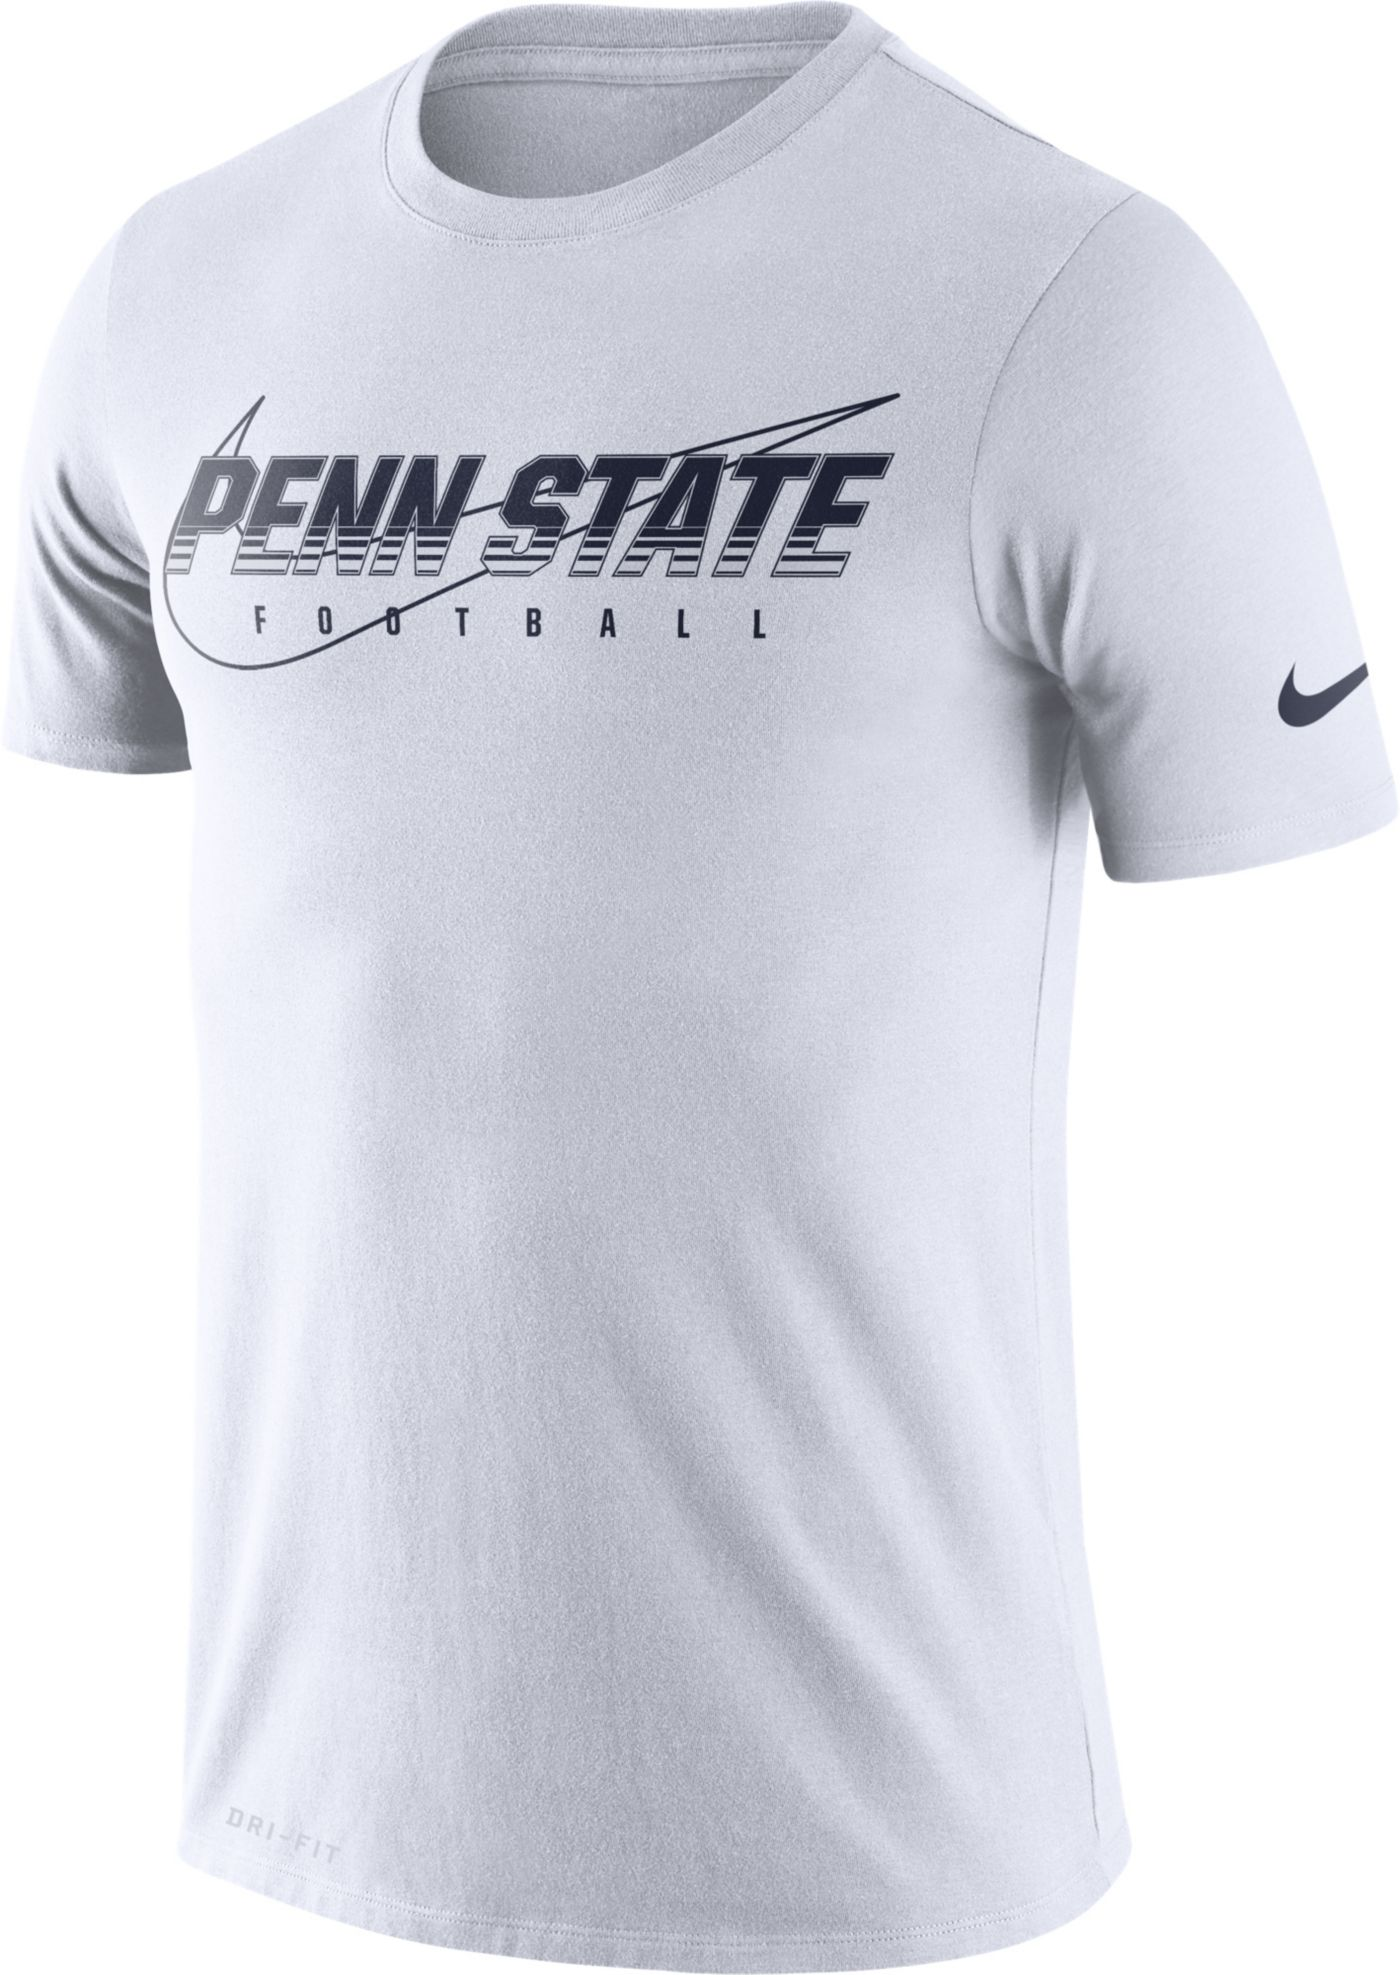 Nike Men's Penn State Nittany Lions Football Dri-FIT Cotton Facility White T-Shirt